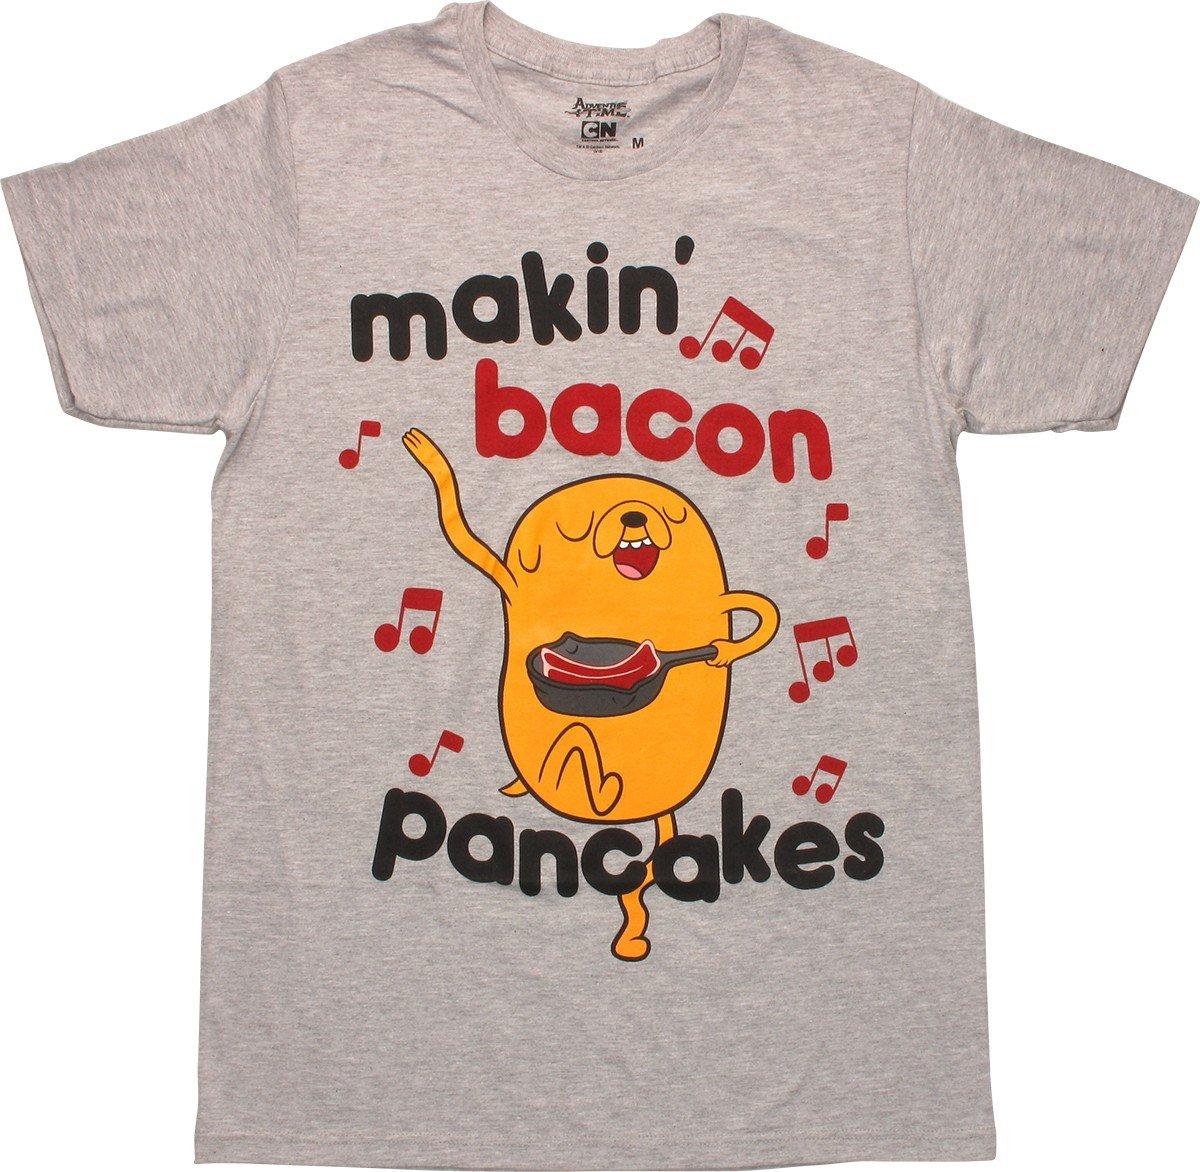 Bacon pancakes t-shirt adventure time tee jake and finn